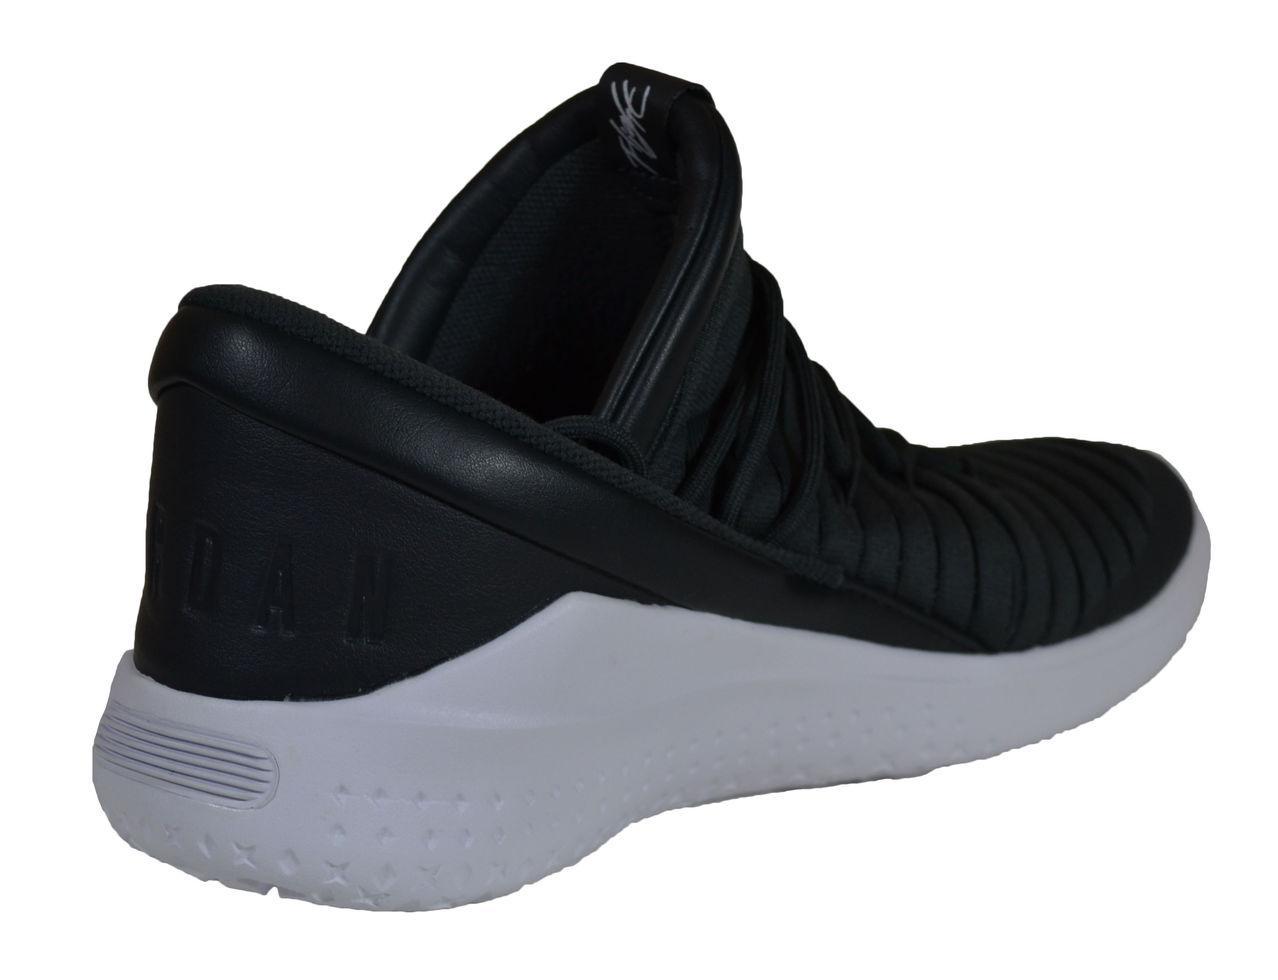 c8f0bc0b Кроссовки мужские Nike Air Jordan Flight Luxe 919715-005 (размер 42,5,  USA-9, 27 см), цена 2 465 грн., купить в Харькове — Prom.ua (ID#679786656)